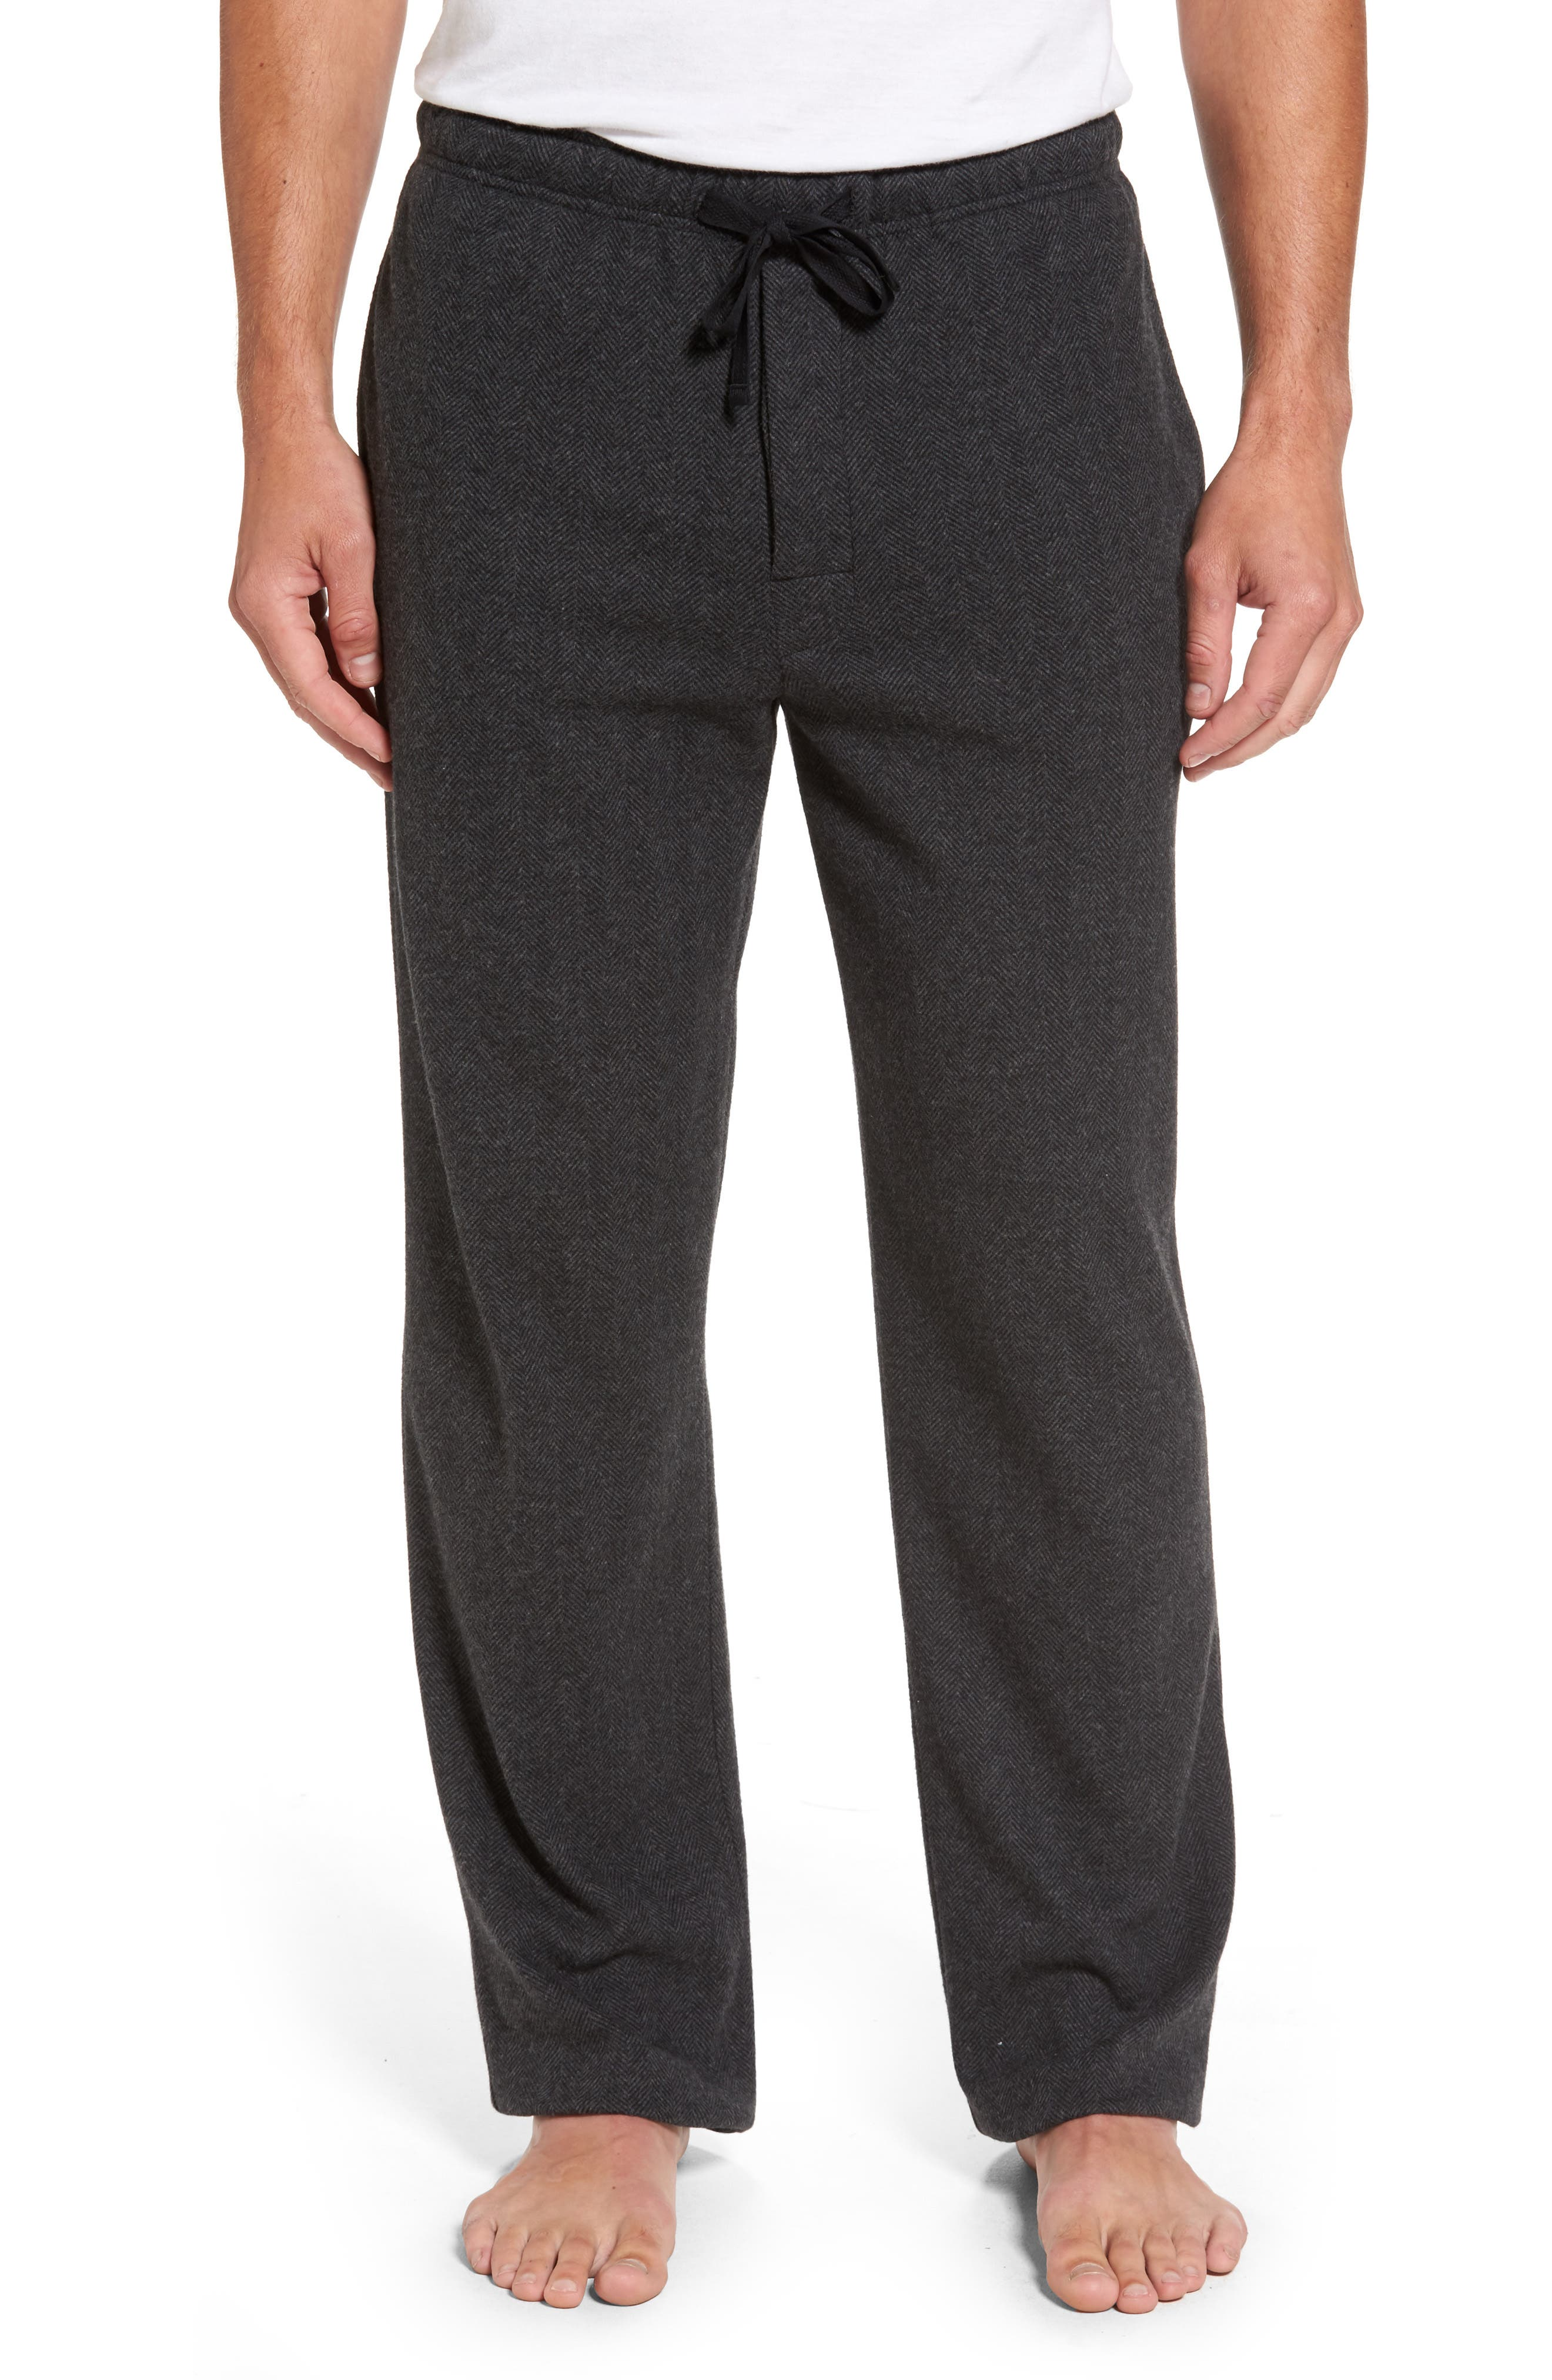 Grayson Lounge Pants,                         Main,                         color, Charcoal